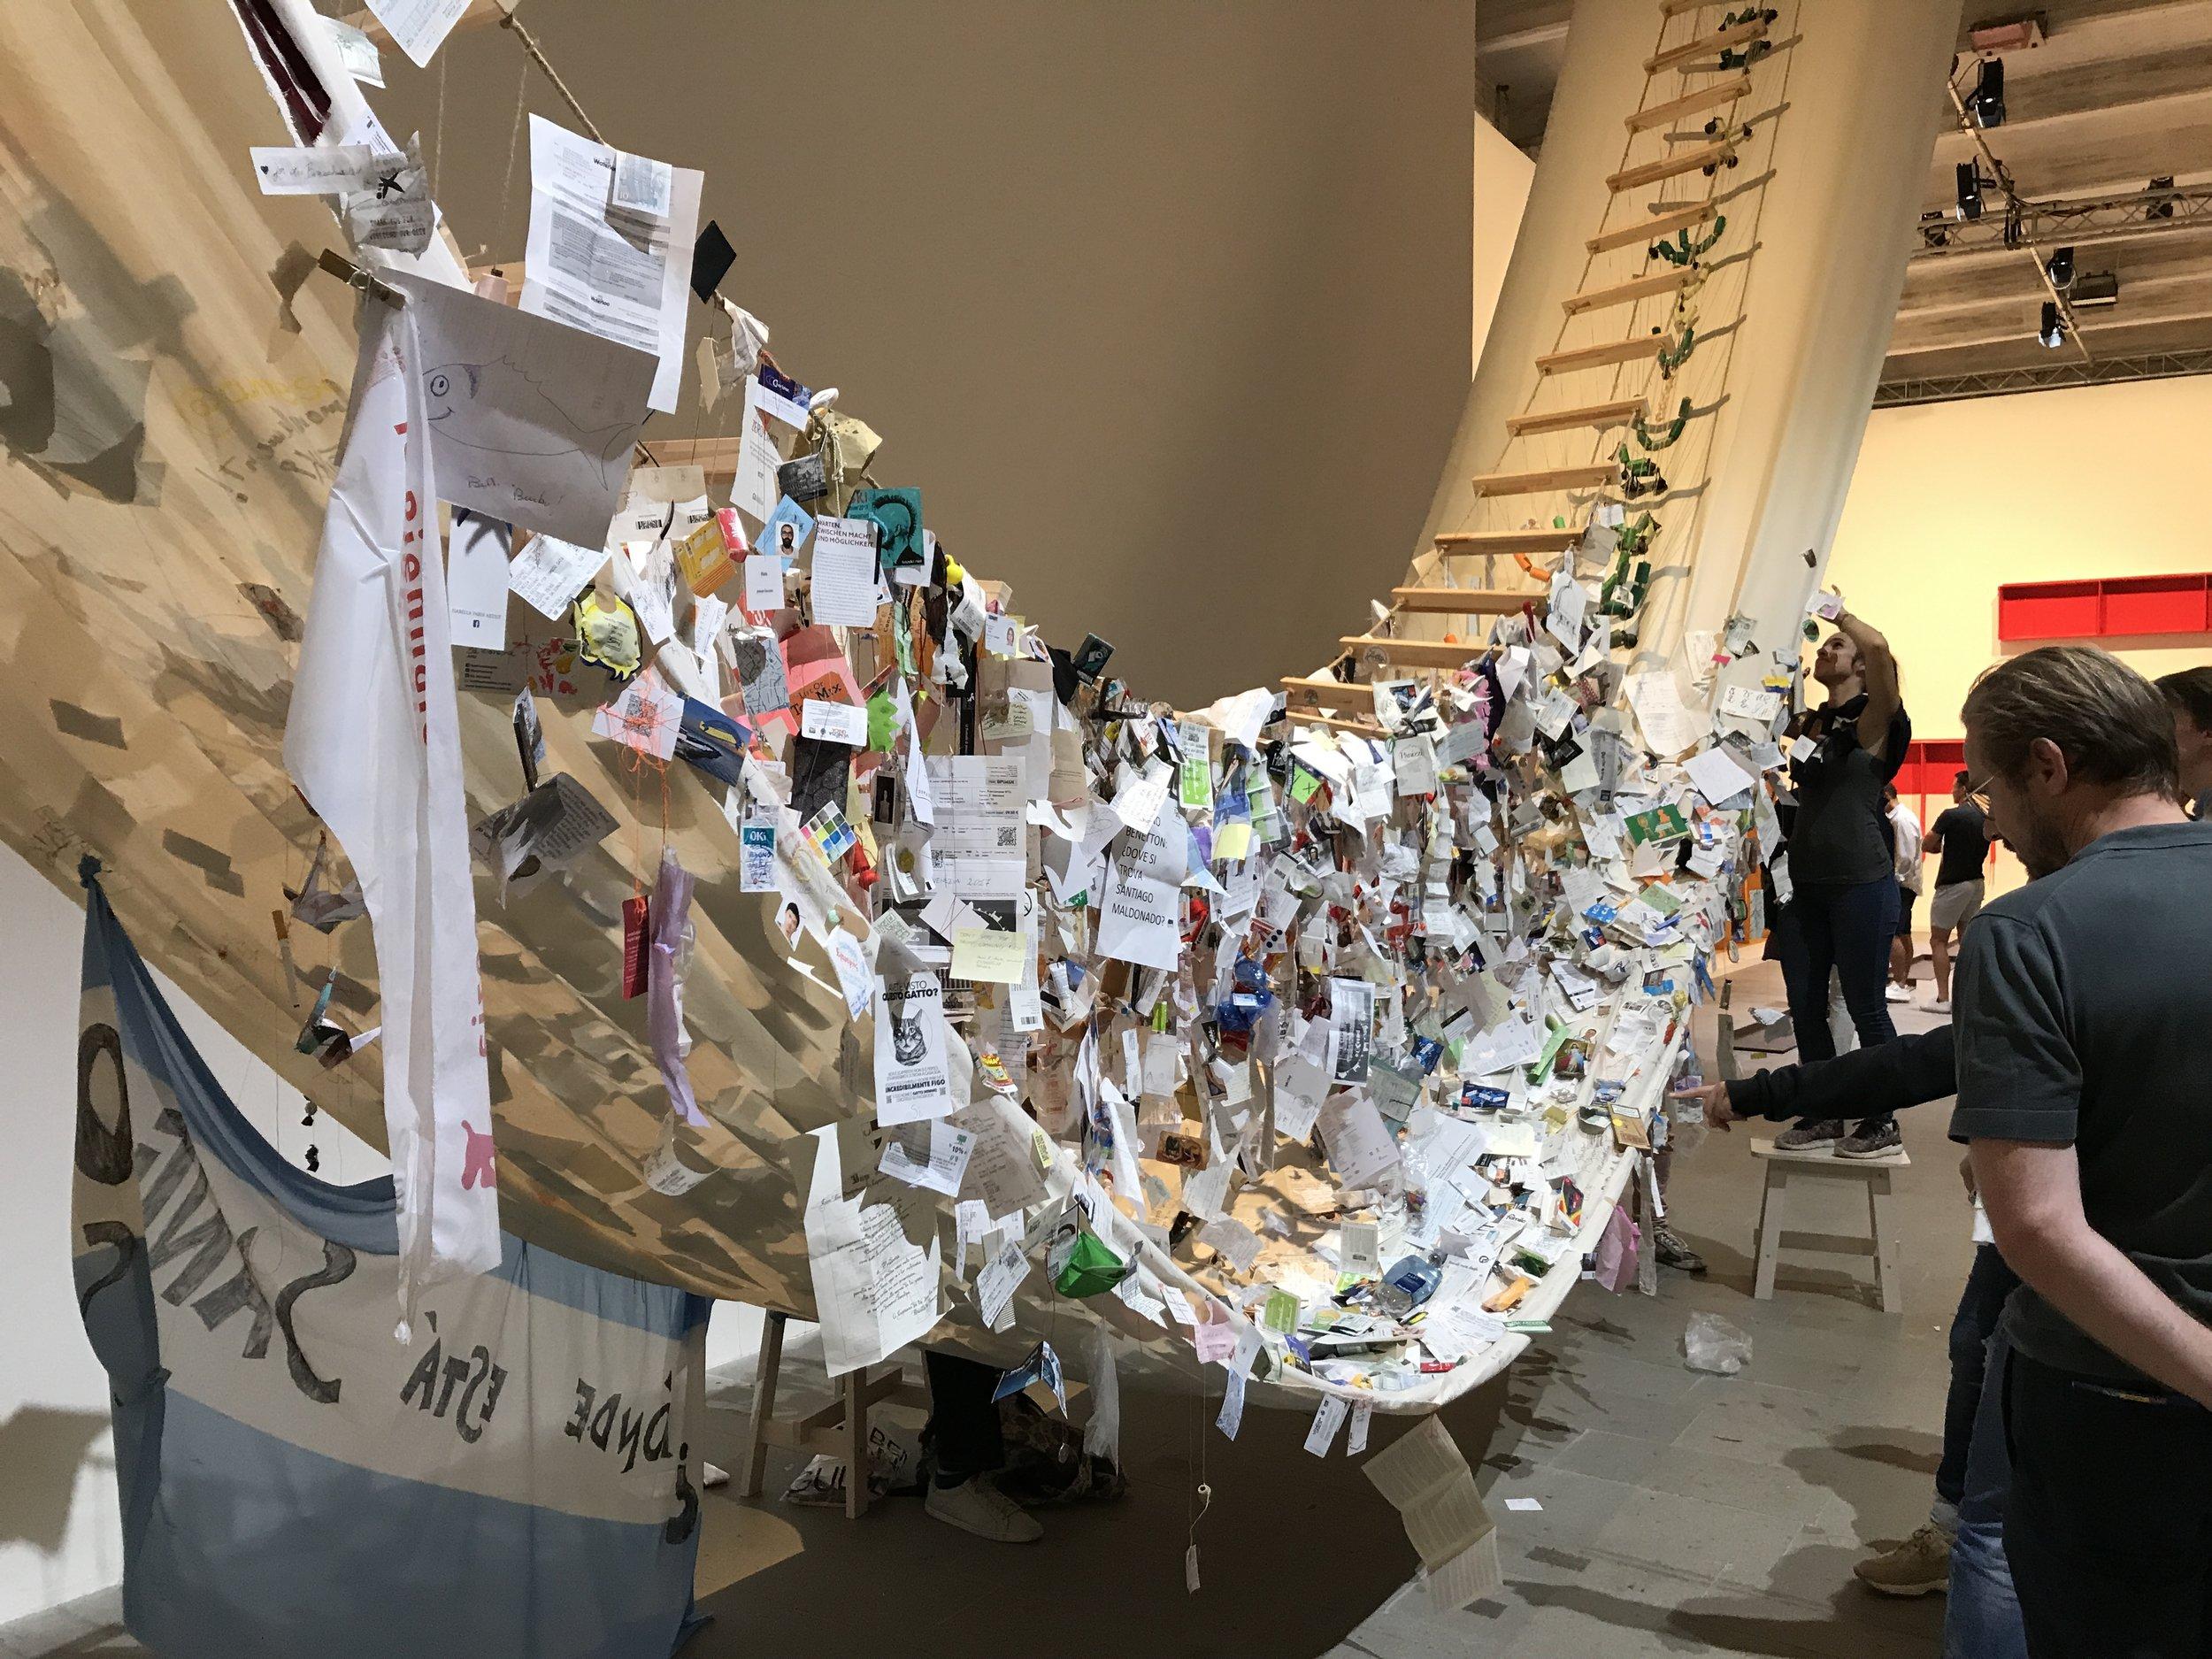 David Medalla, A Stitch in Time, Venetië september 2017